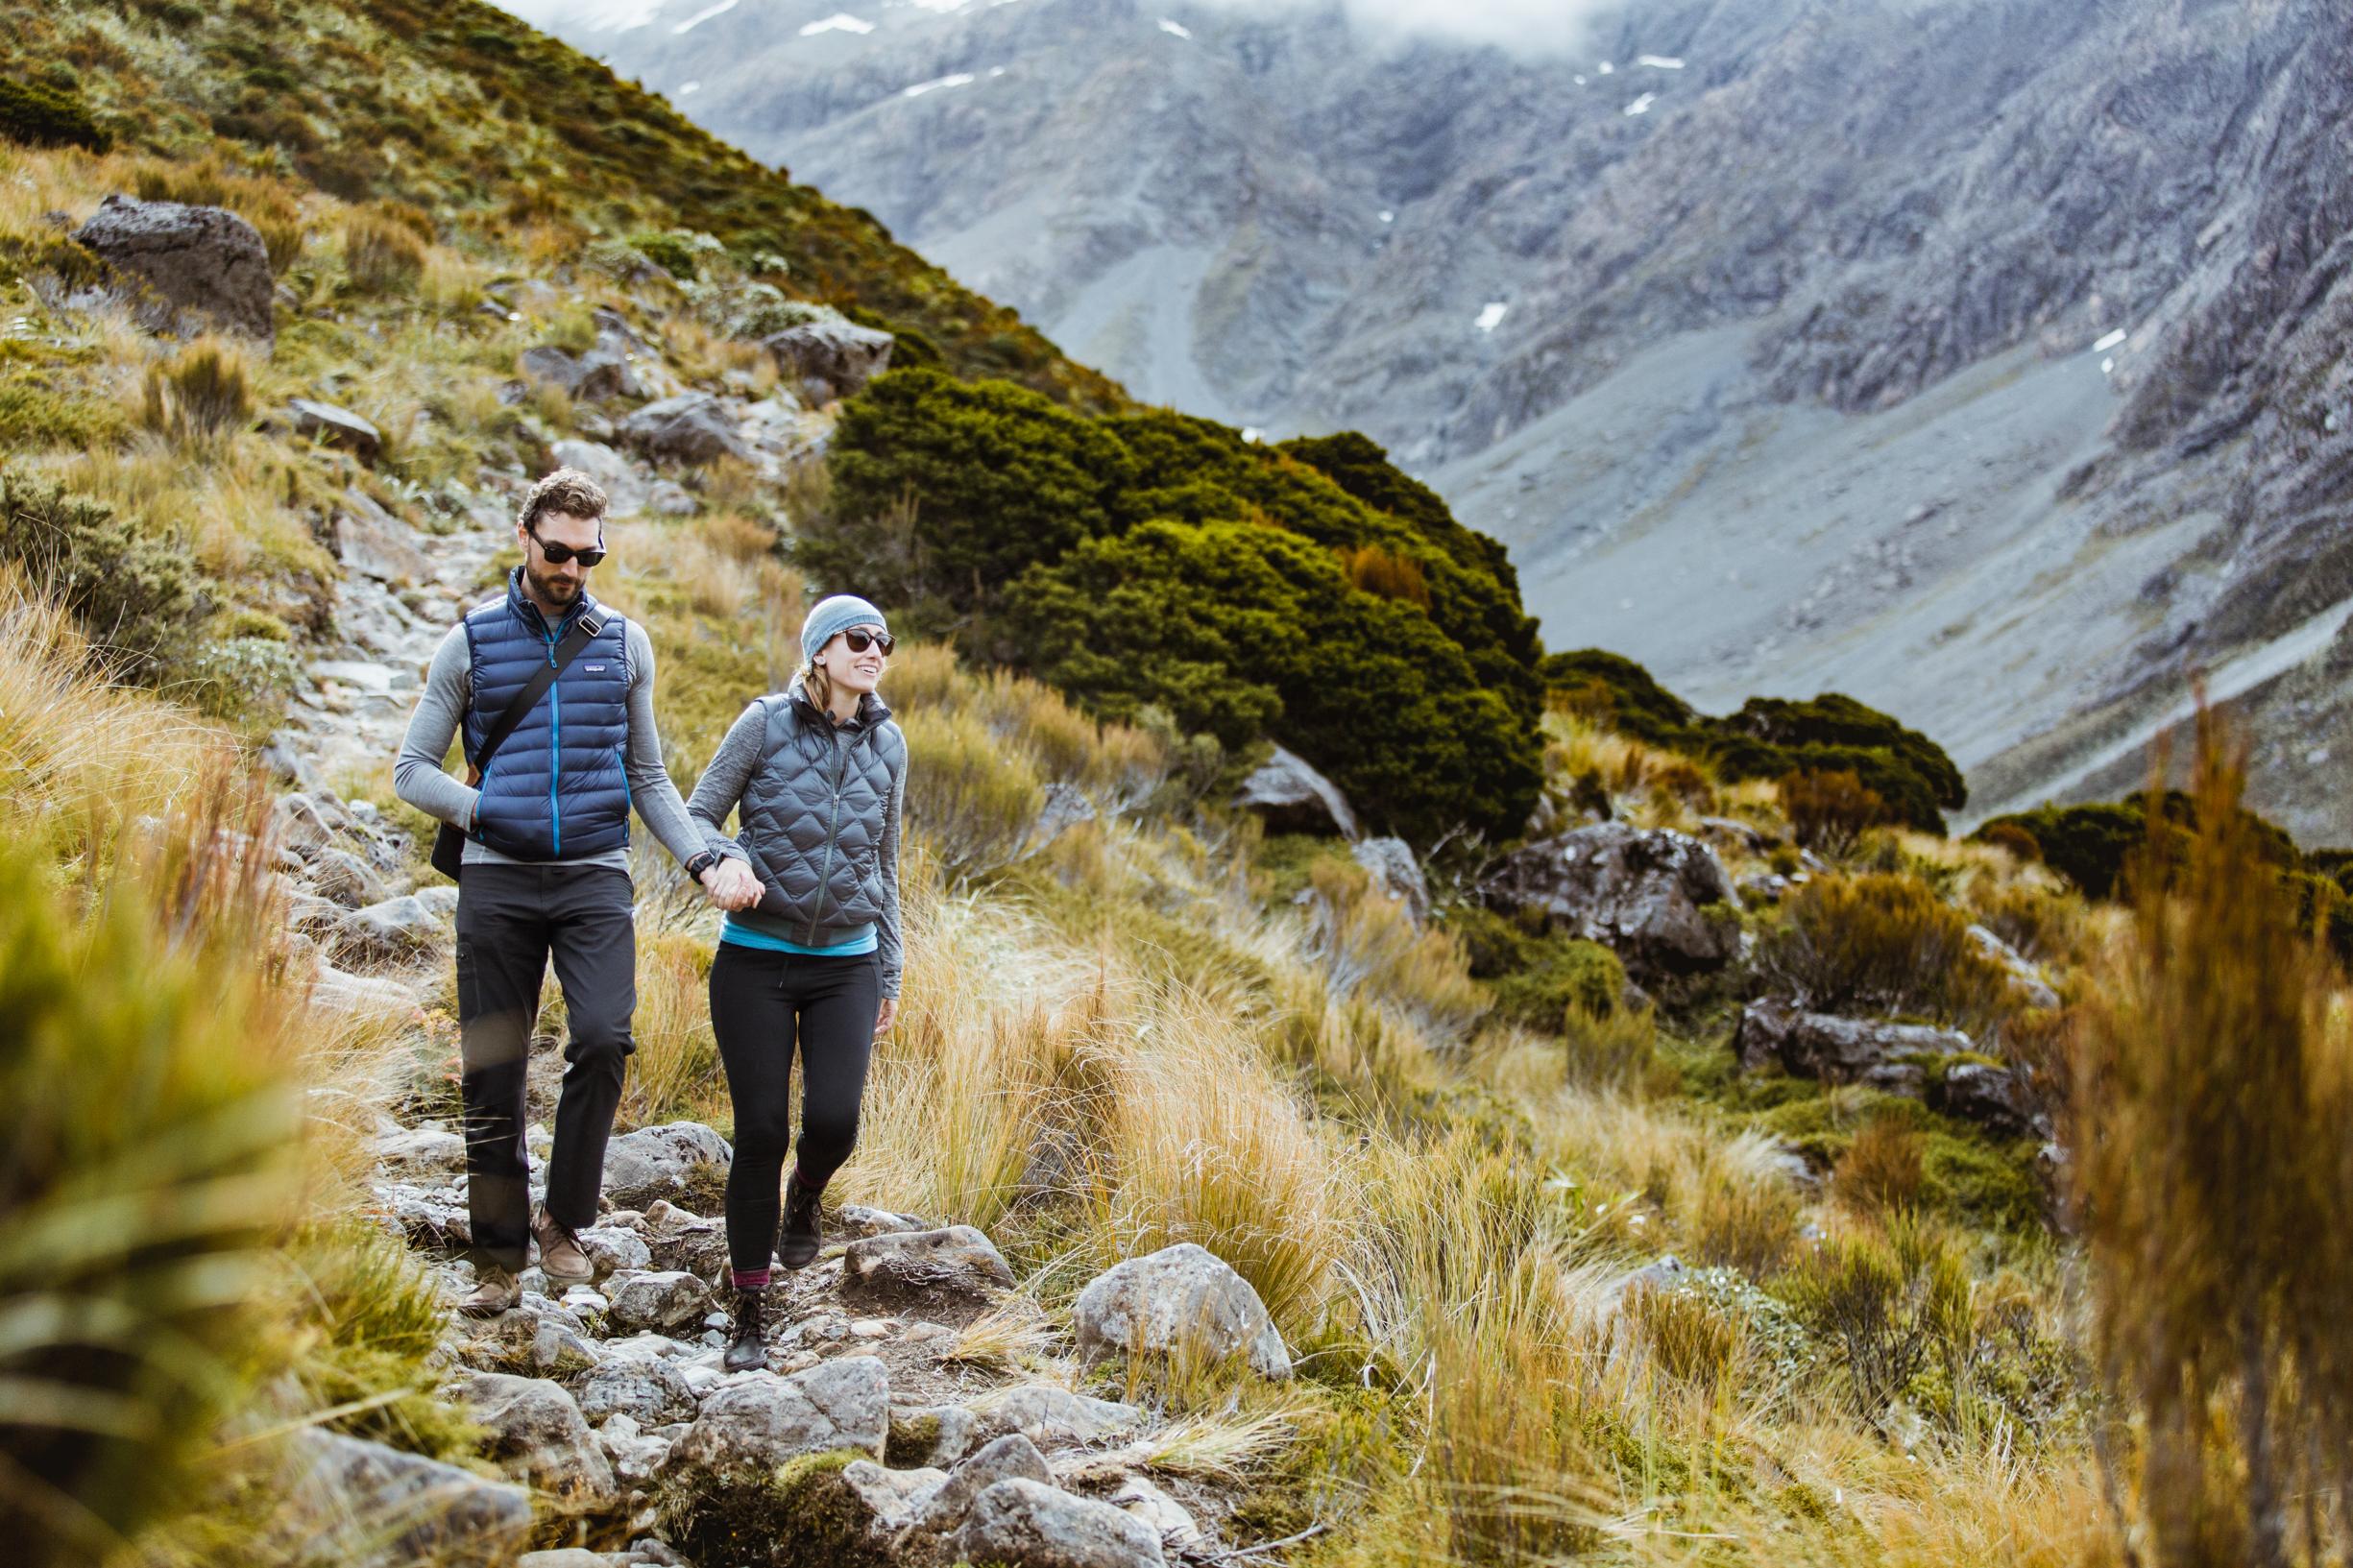 New zealand trip adventure photos backpacking roadtrip glaciers wanaka volcanoes mt cook 032.jpg